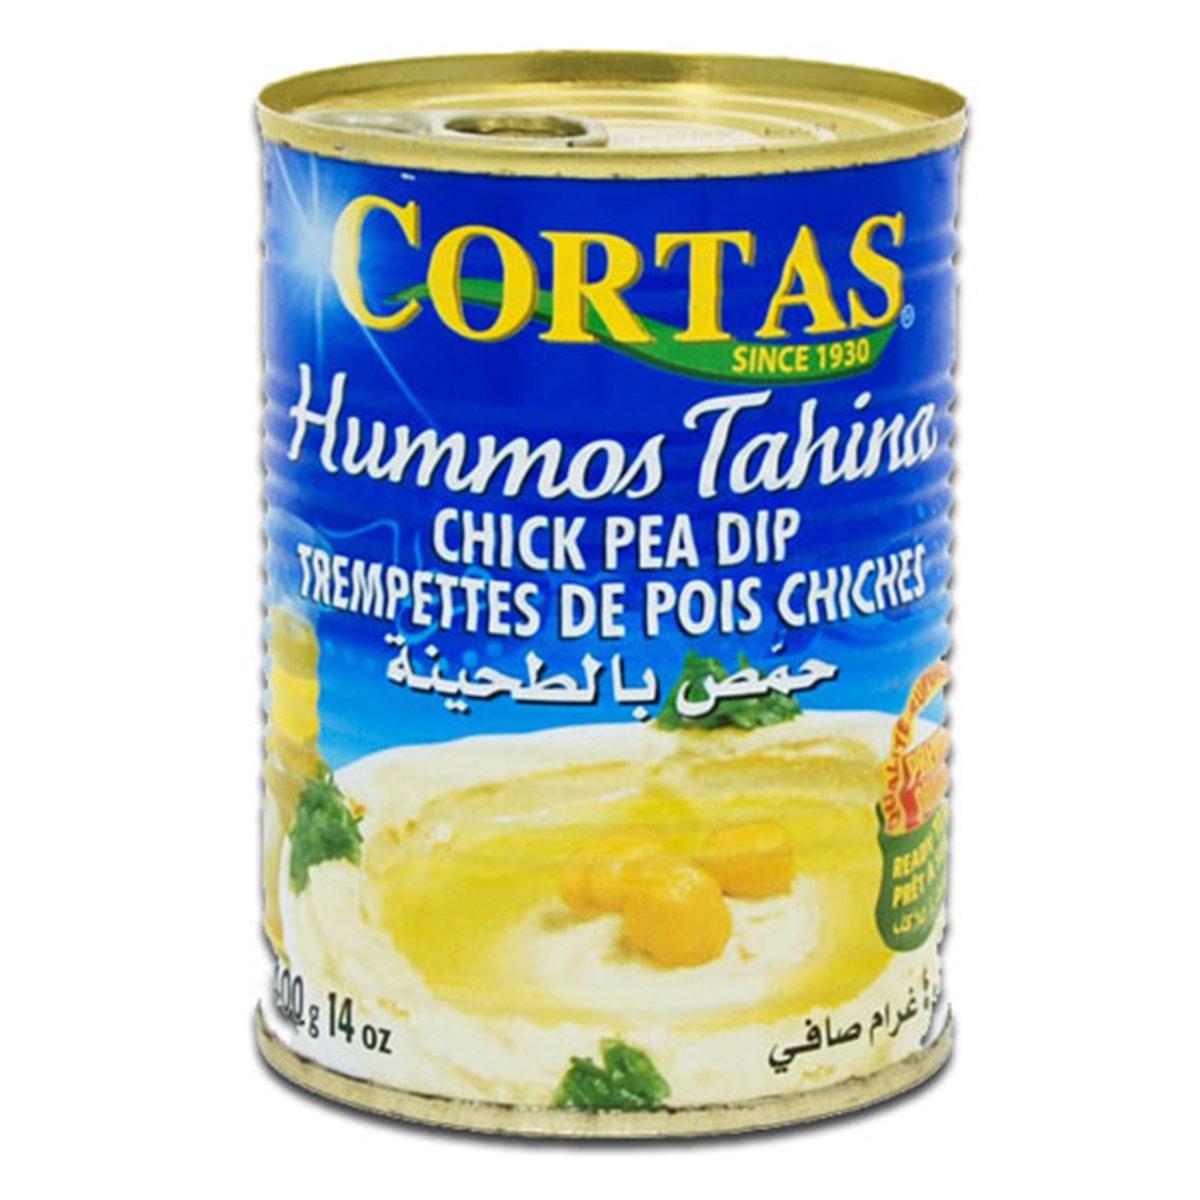 Buy Cortas Hummos Tahini (Chick Pea Dip) Ready to Serve - 400 gm